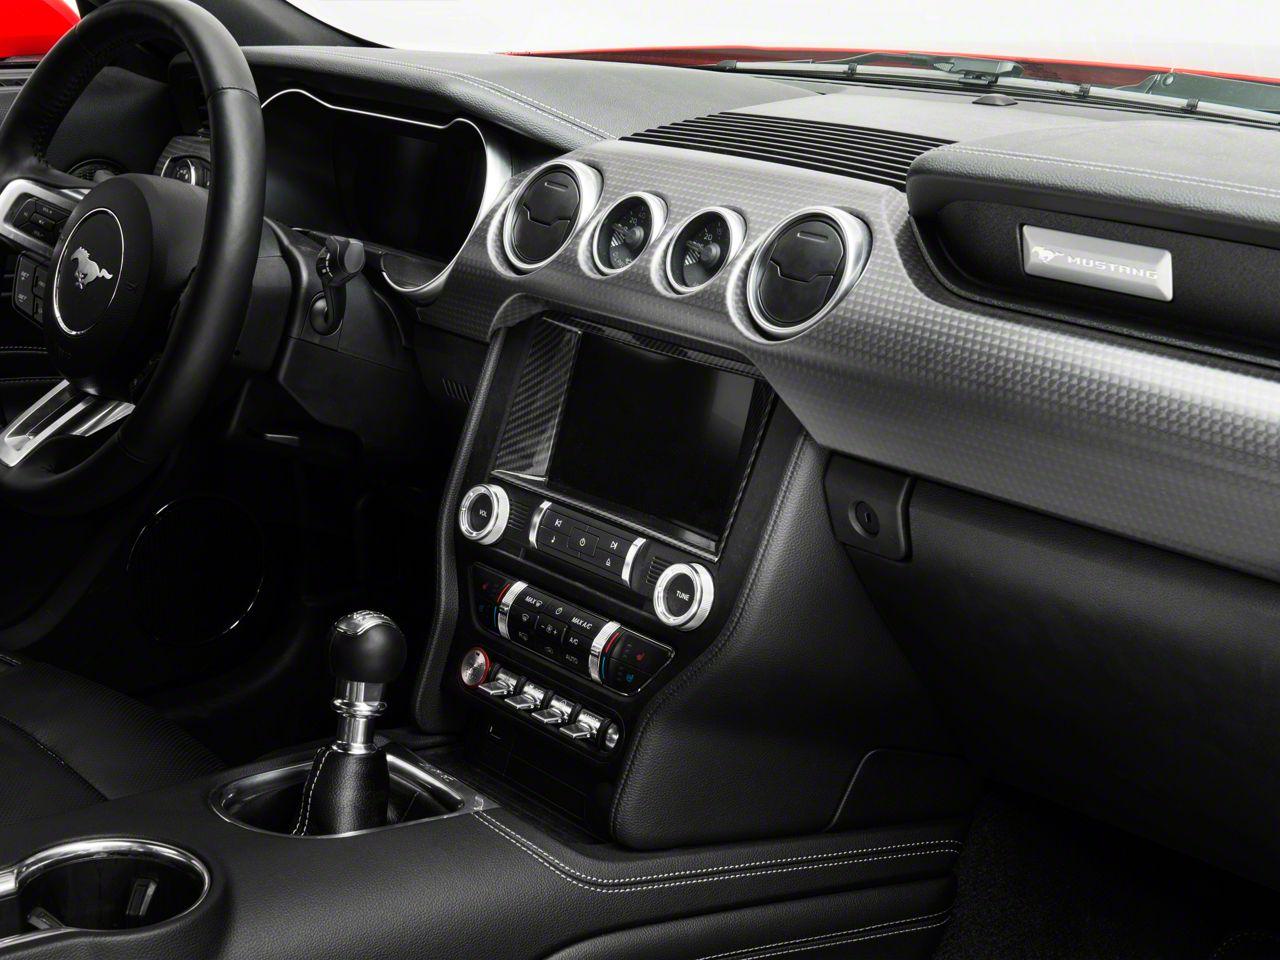 SpeedForm Carbon Fiber Style Touchscreen Bezel (15-19 All)